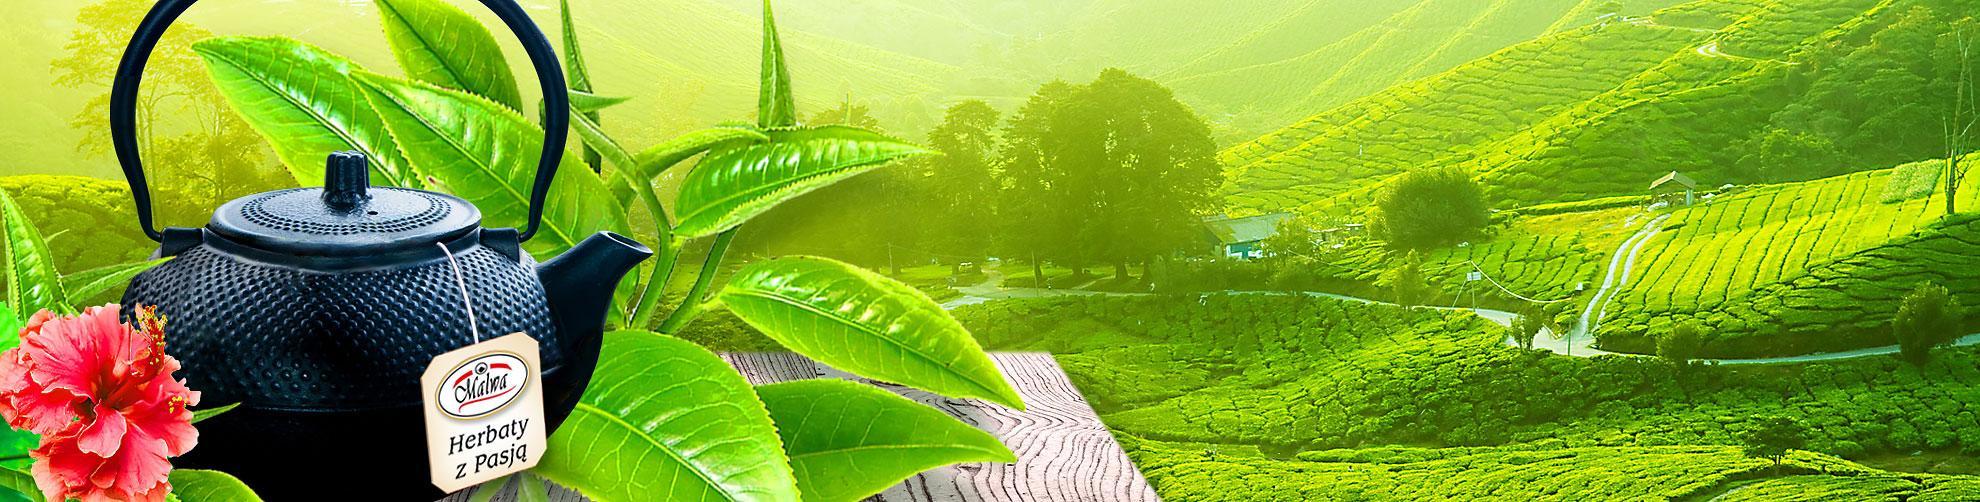 Malwa Tea - Herbaty Zielone